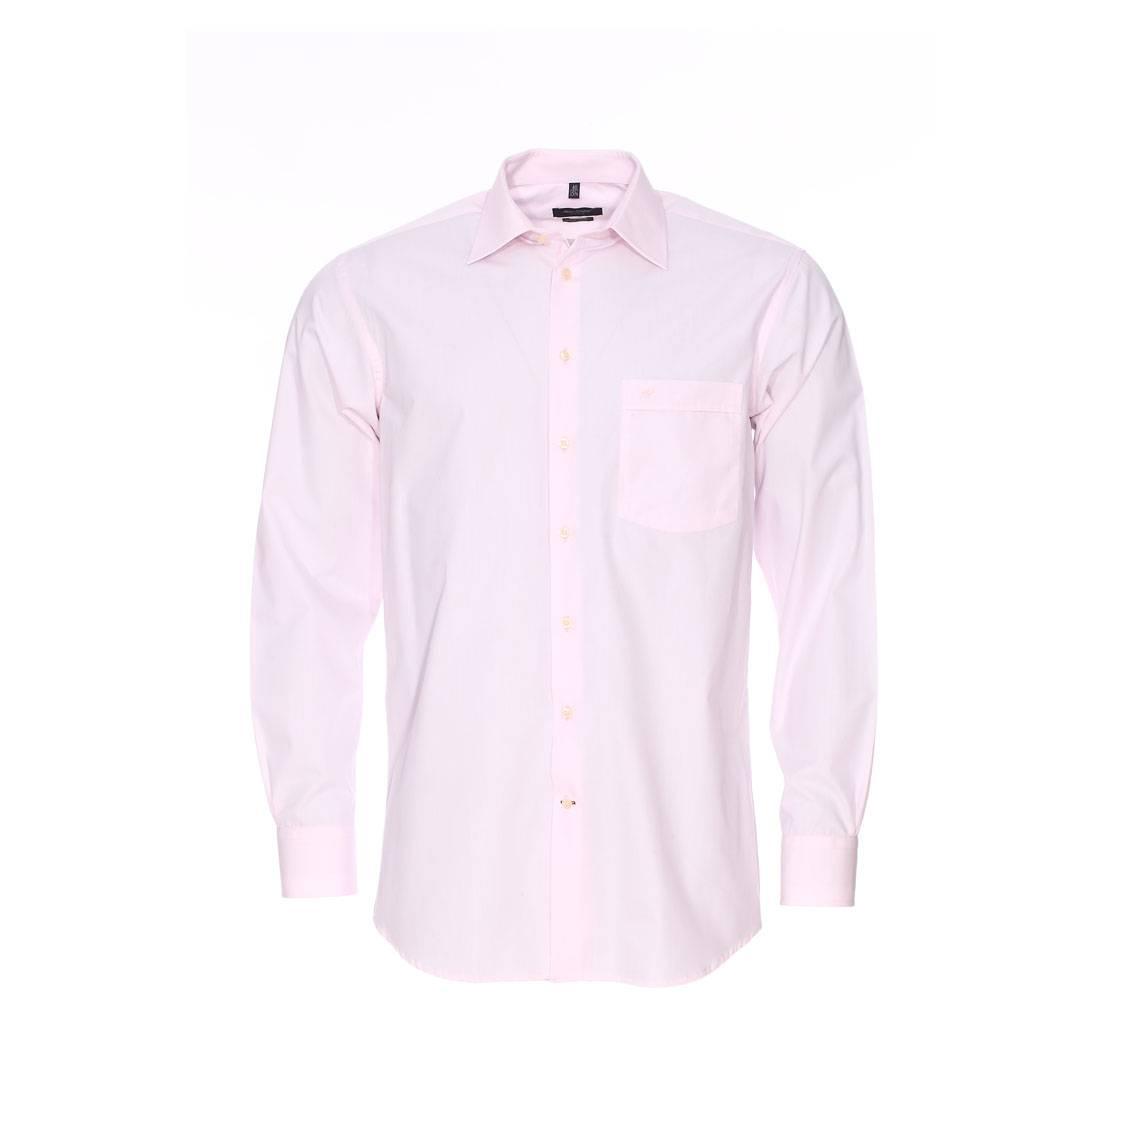 chemise droite jean chatel rose p le repassage facile. Black Bedroom Furniture Sets. Home Design Ideas